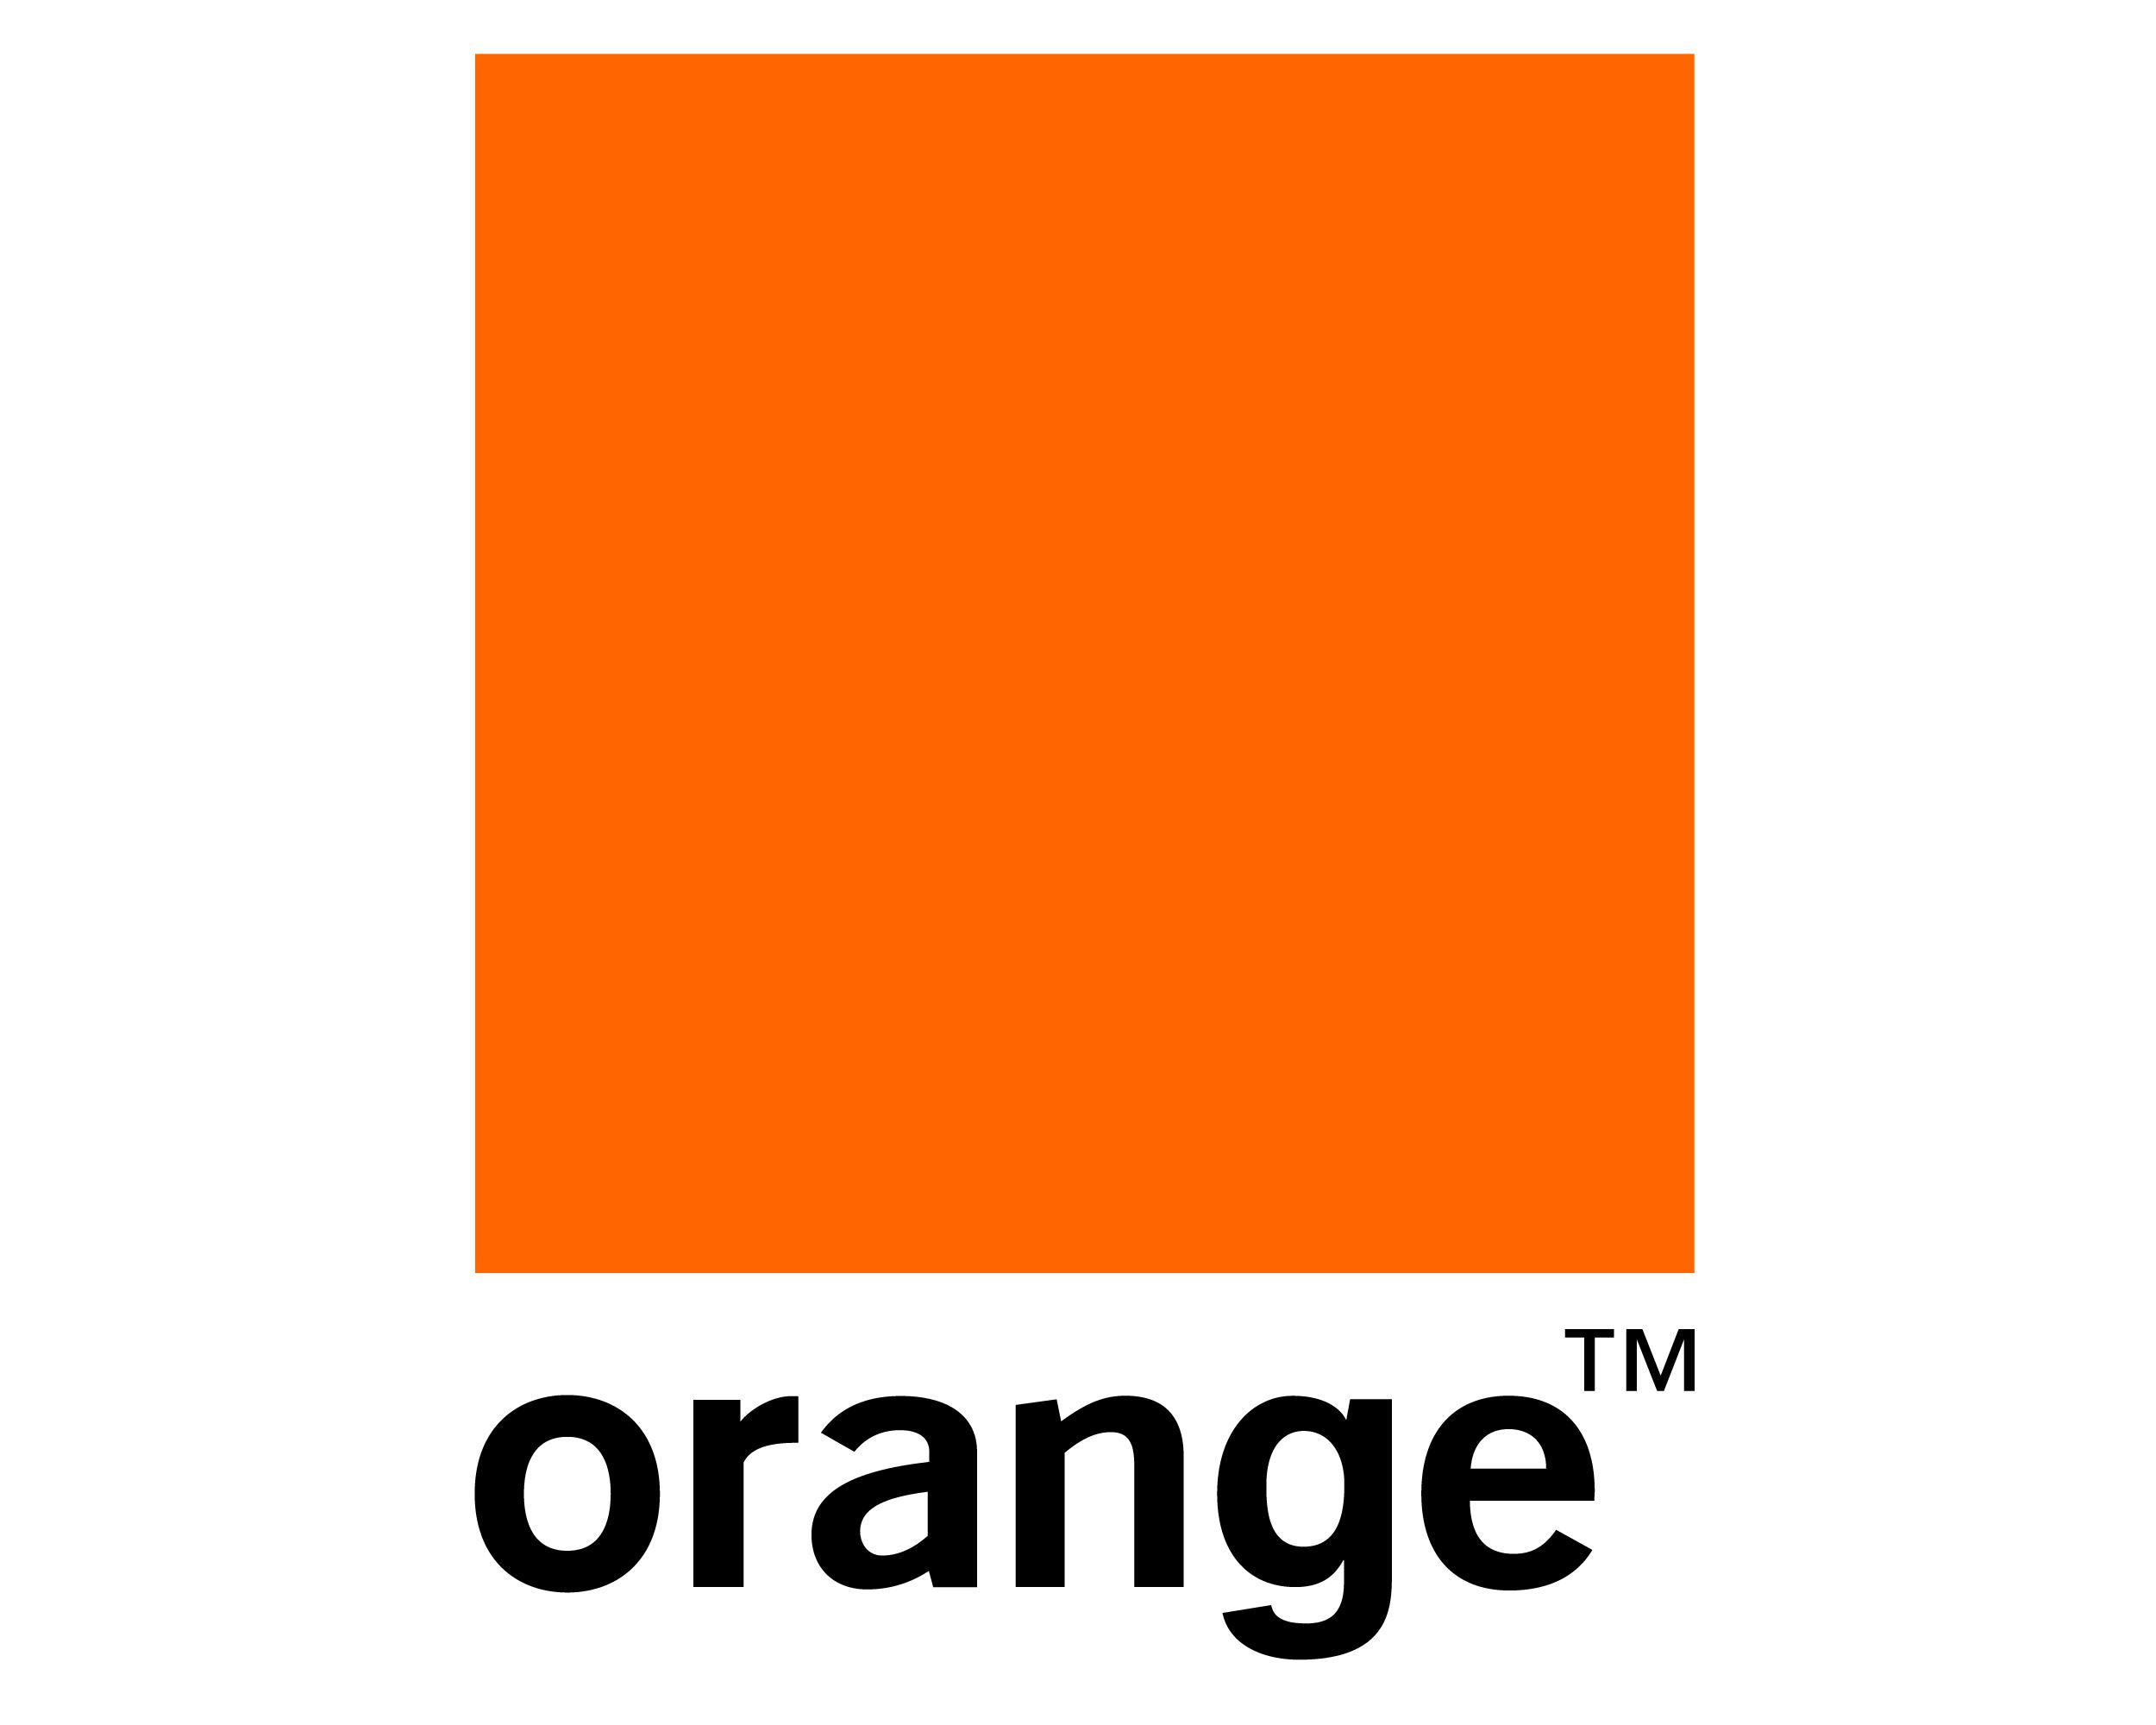 orange logo orange symbol meaning history and evolution